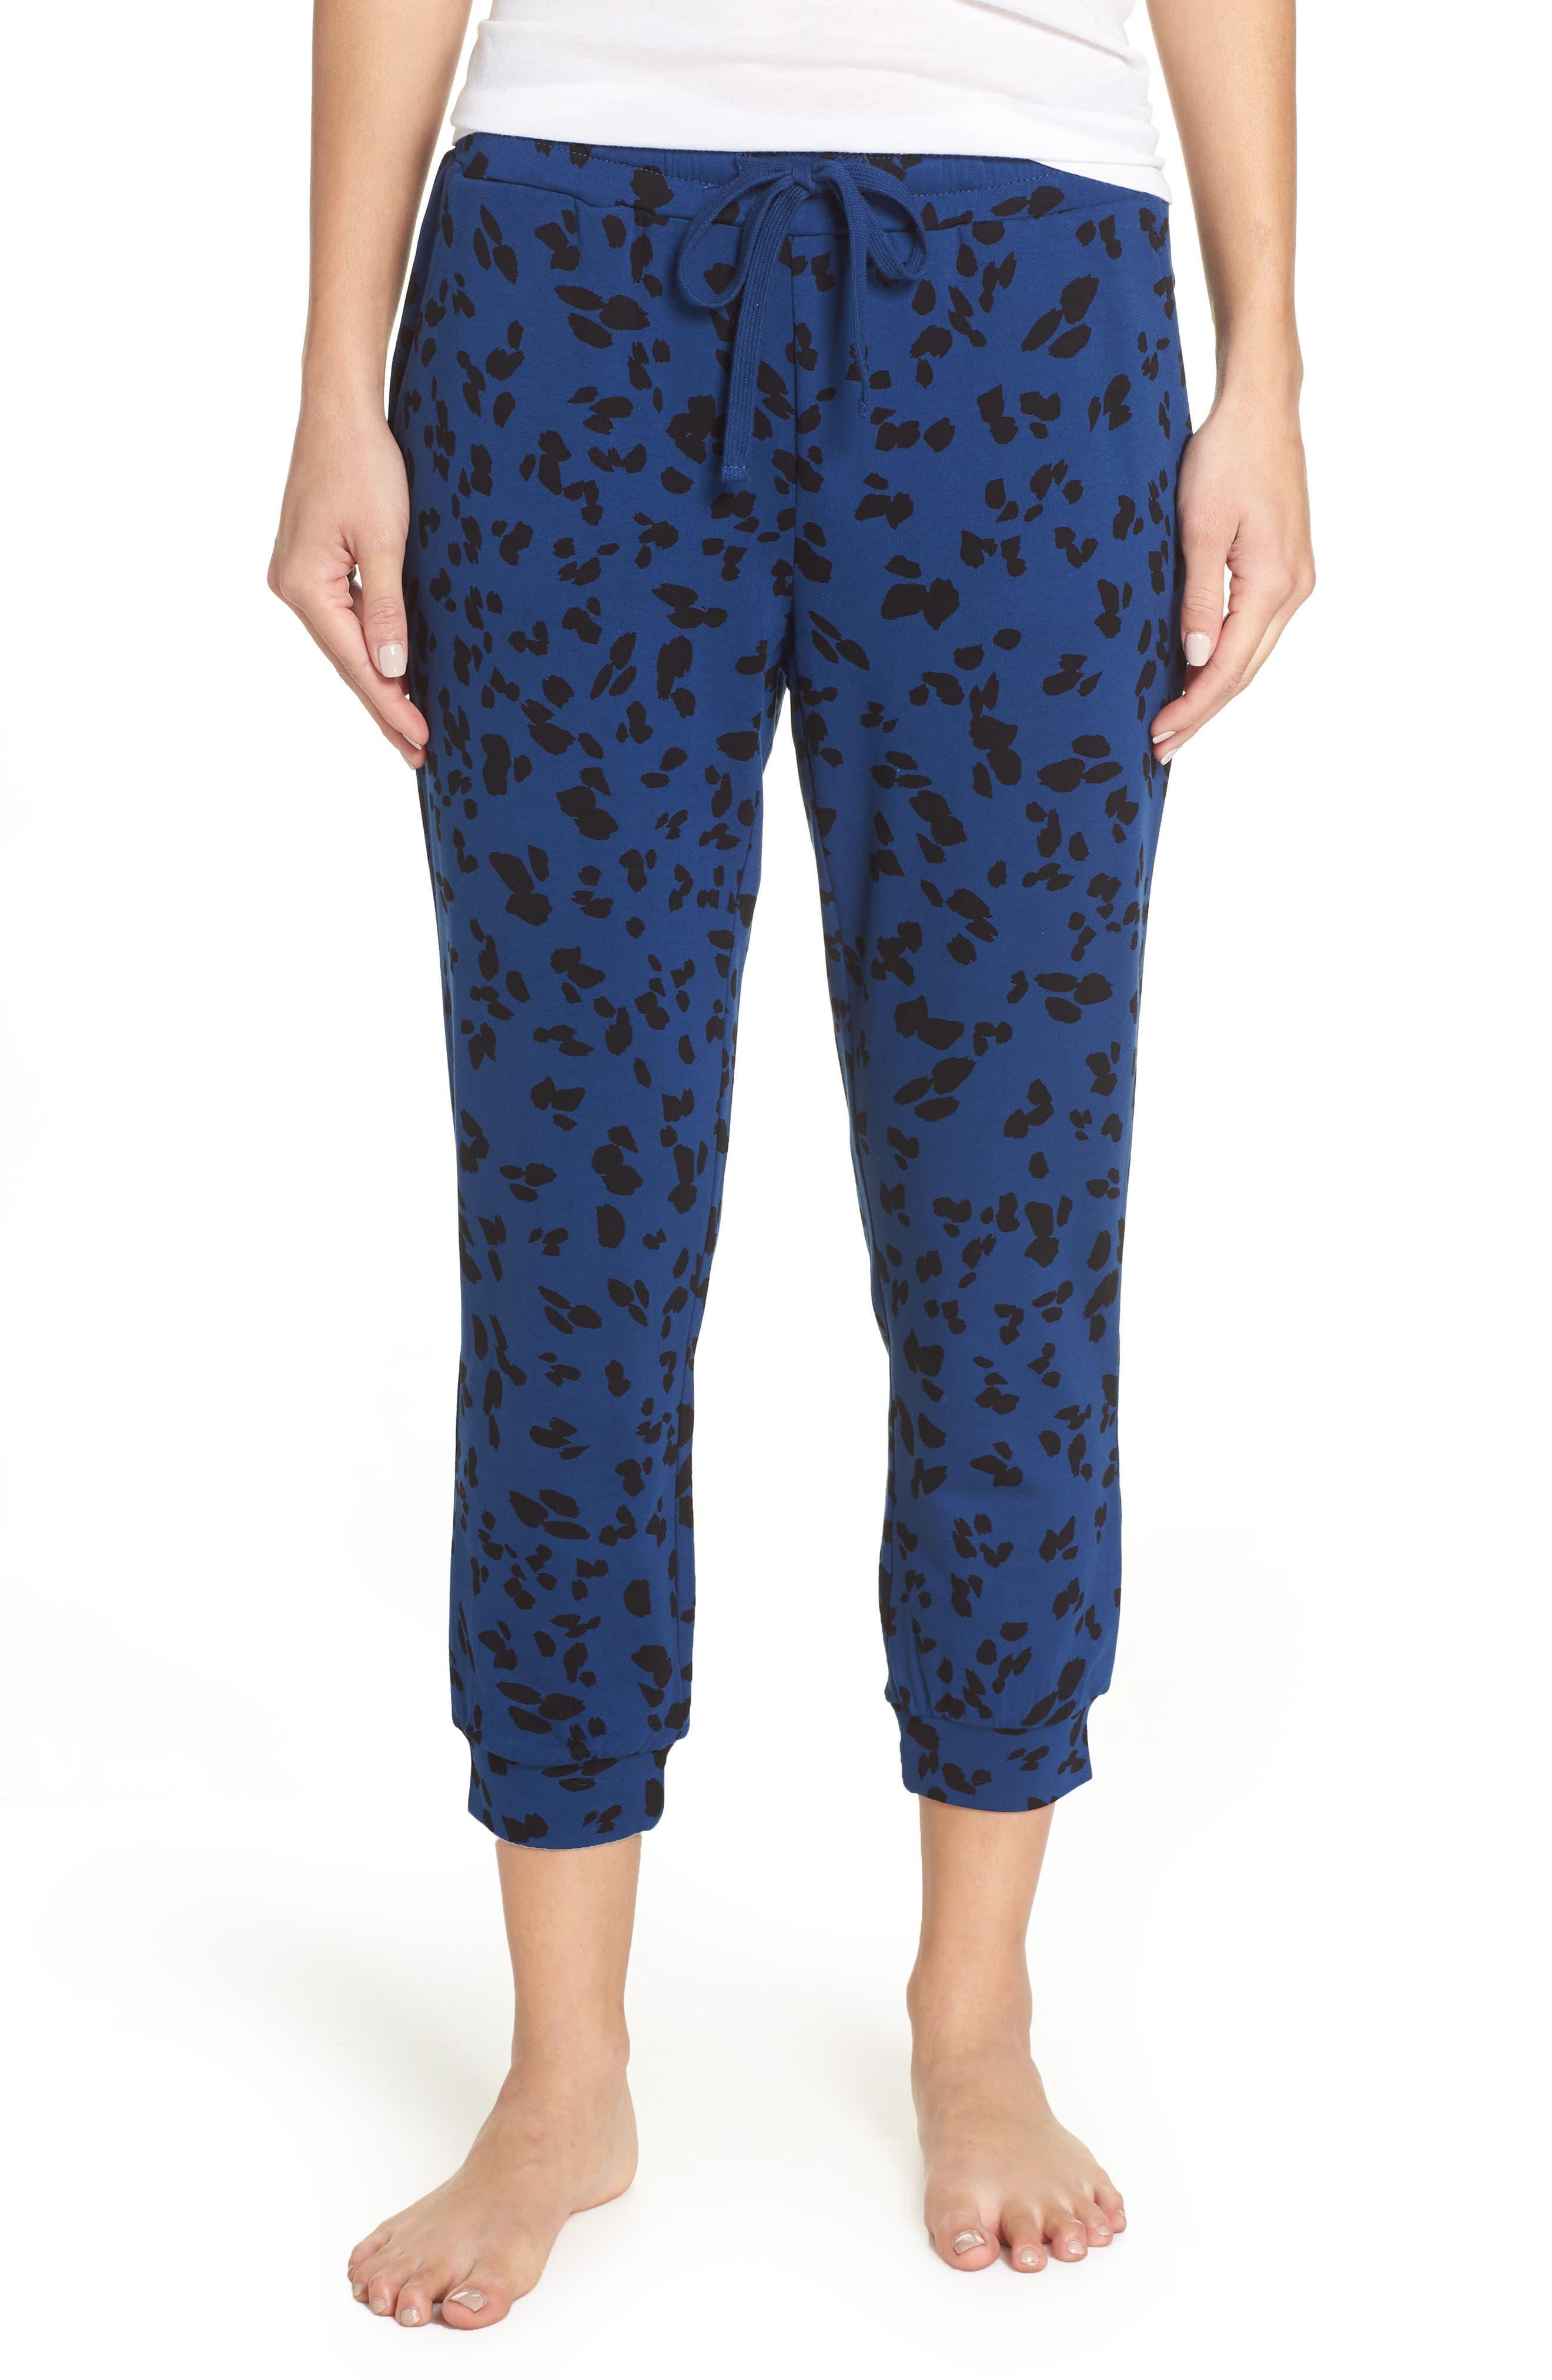 Totally Trending Leopard Print Jogger Pants,                         Main,                         color, MARINE